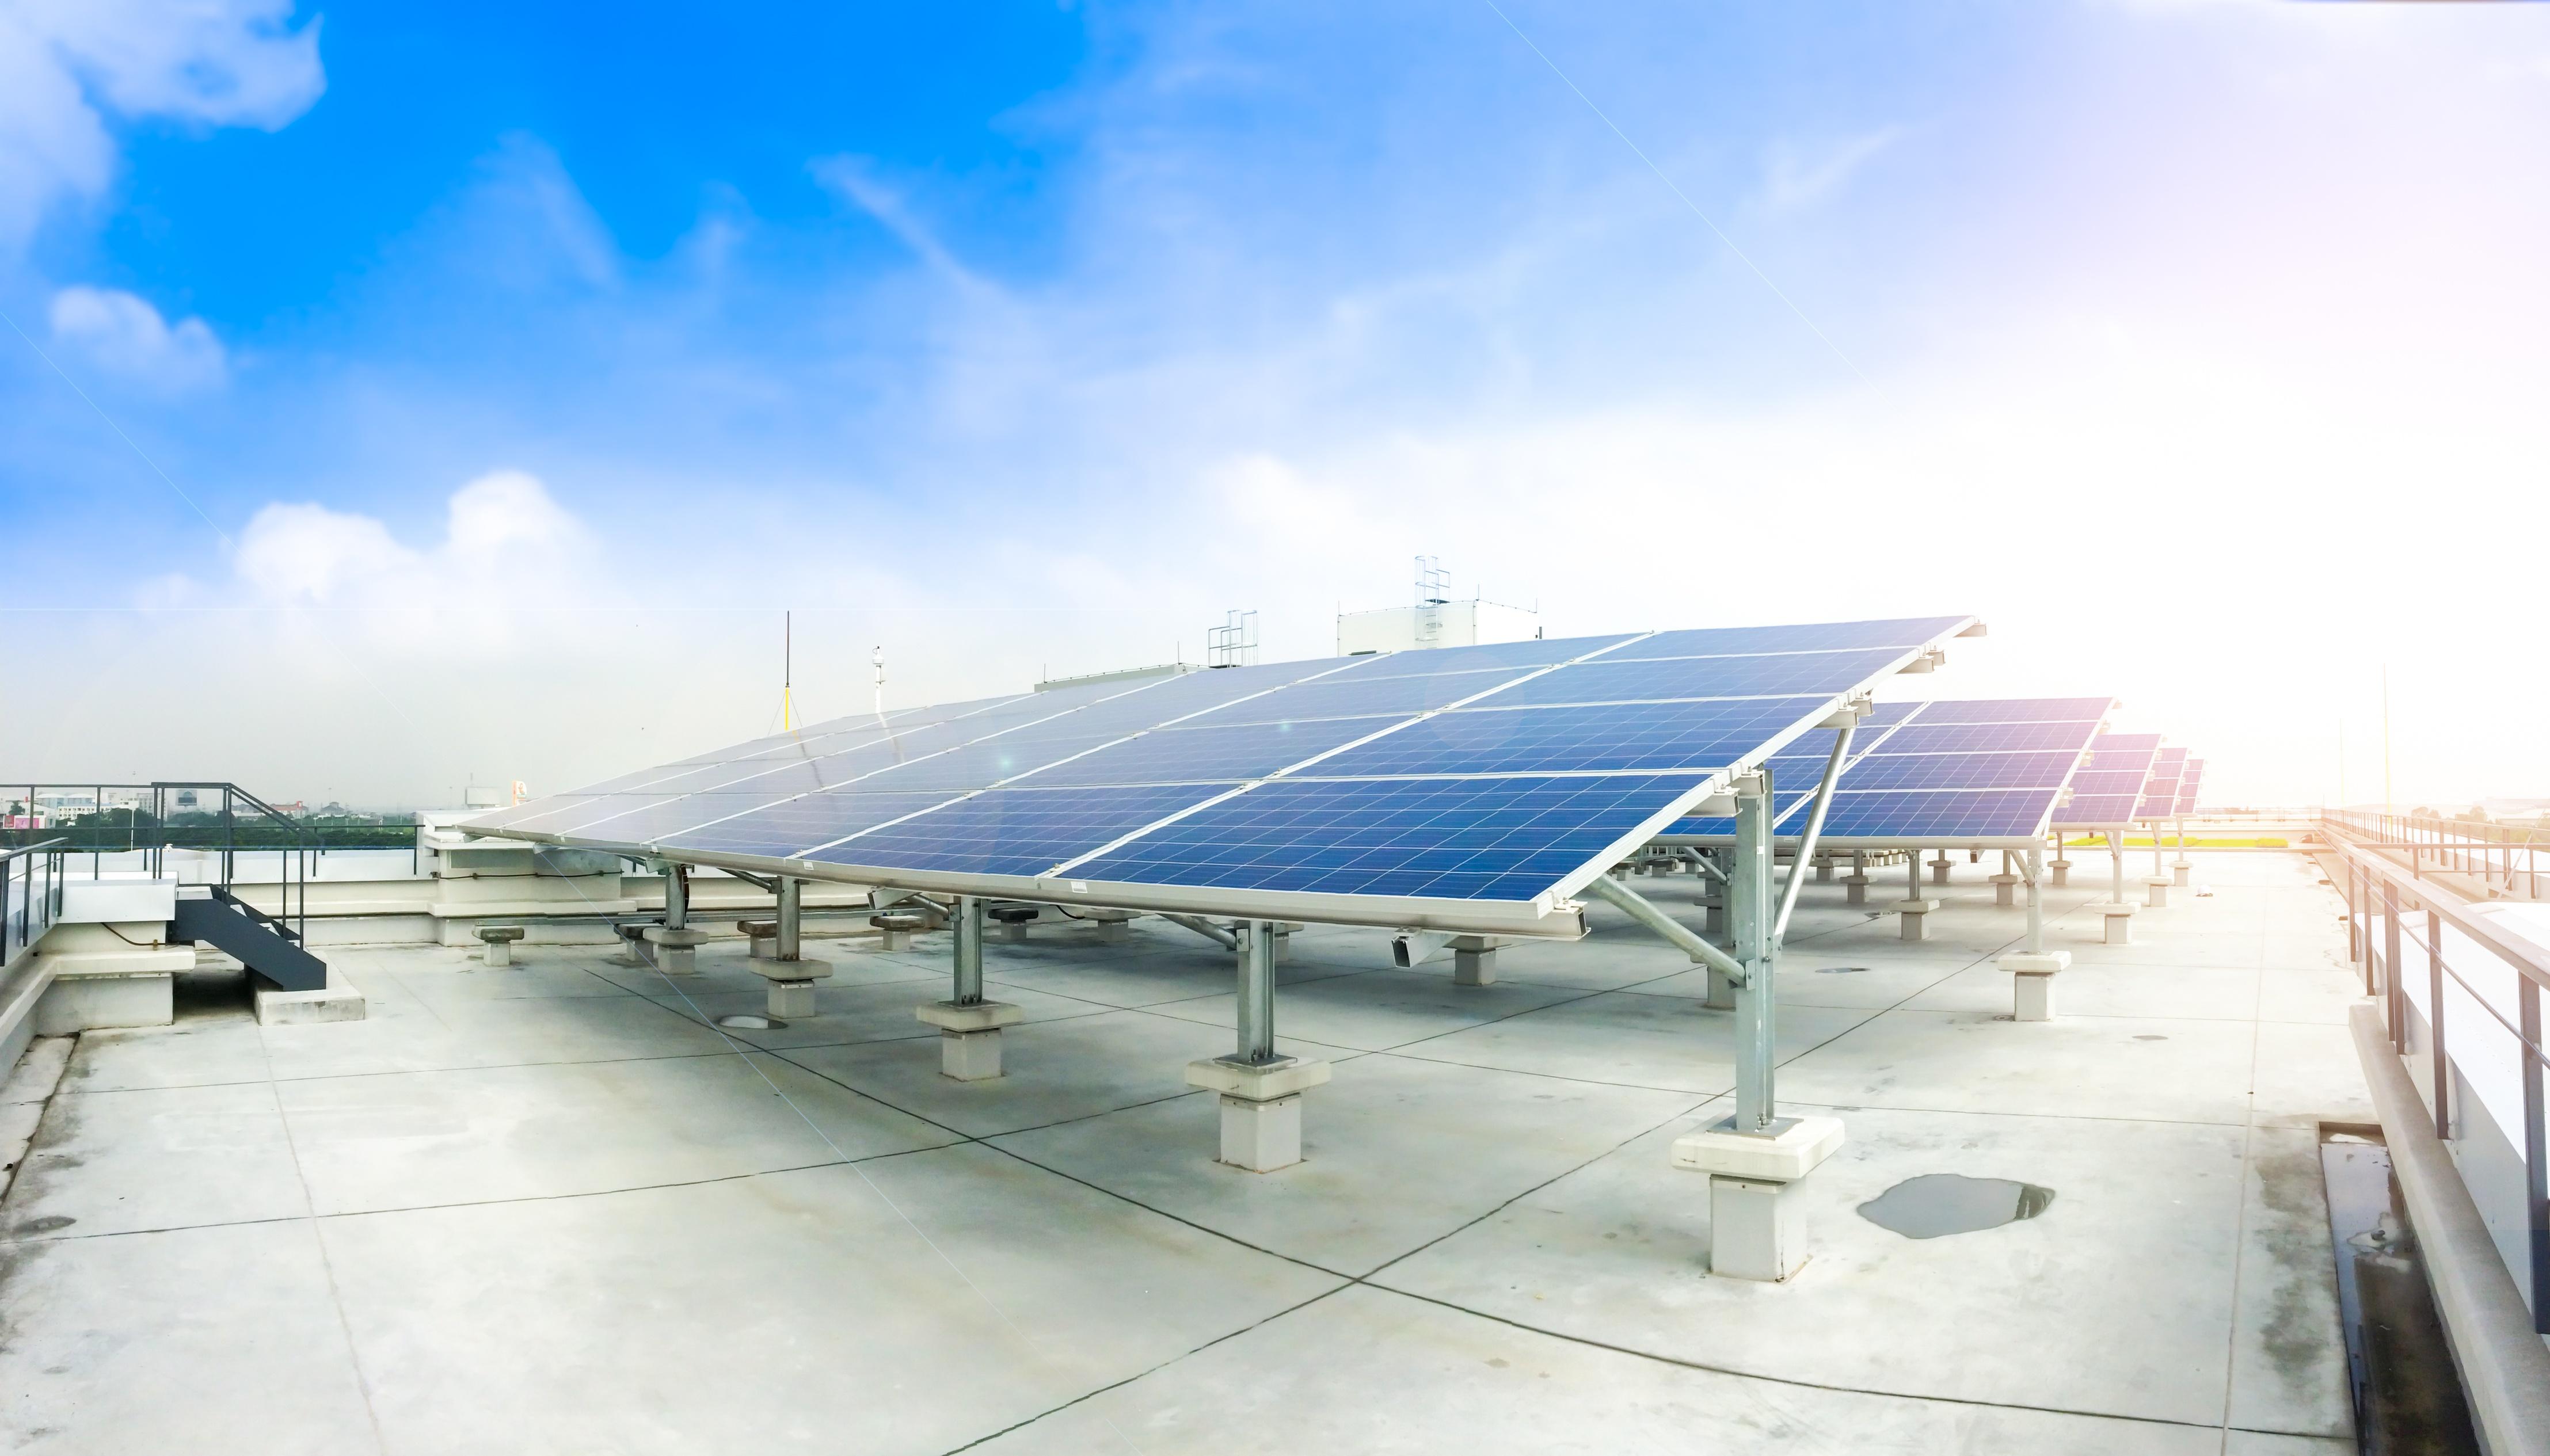 solar_panels_roof_impact_plastics.jpg